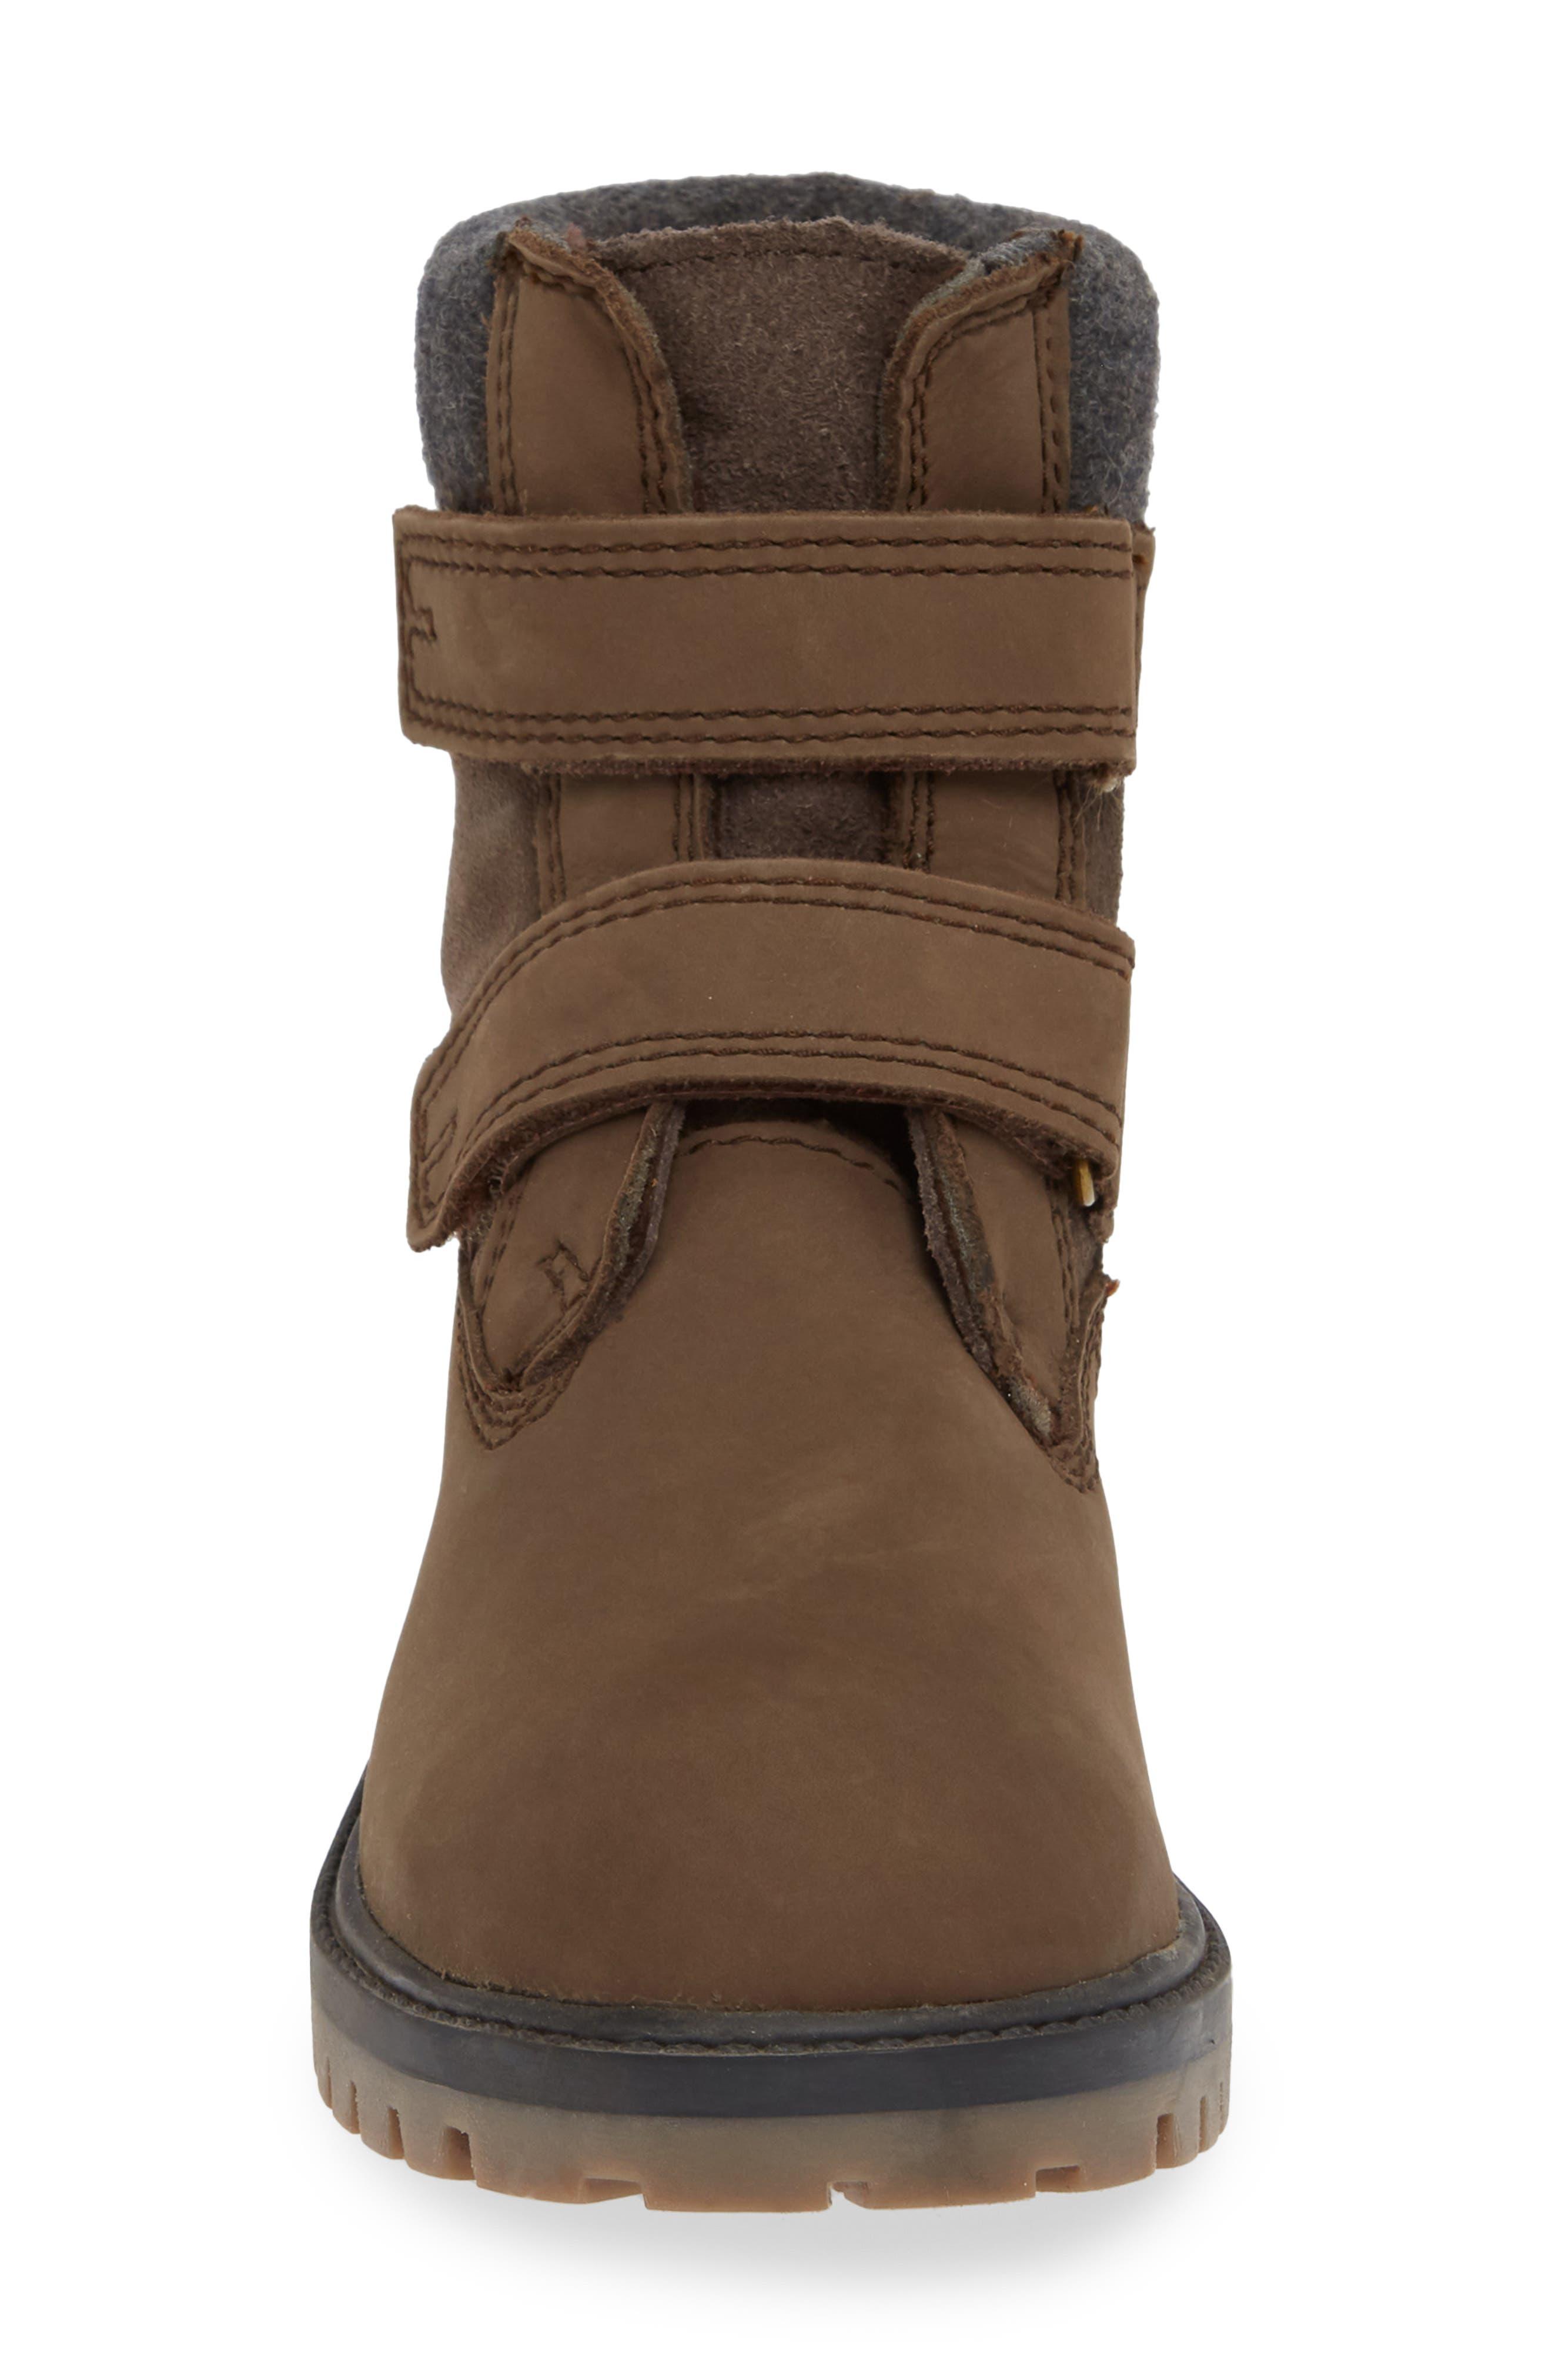 Takodav Waterproof Boot,                             Alternate thumbnail 4, color,                             200